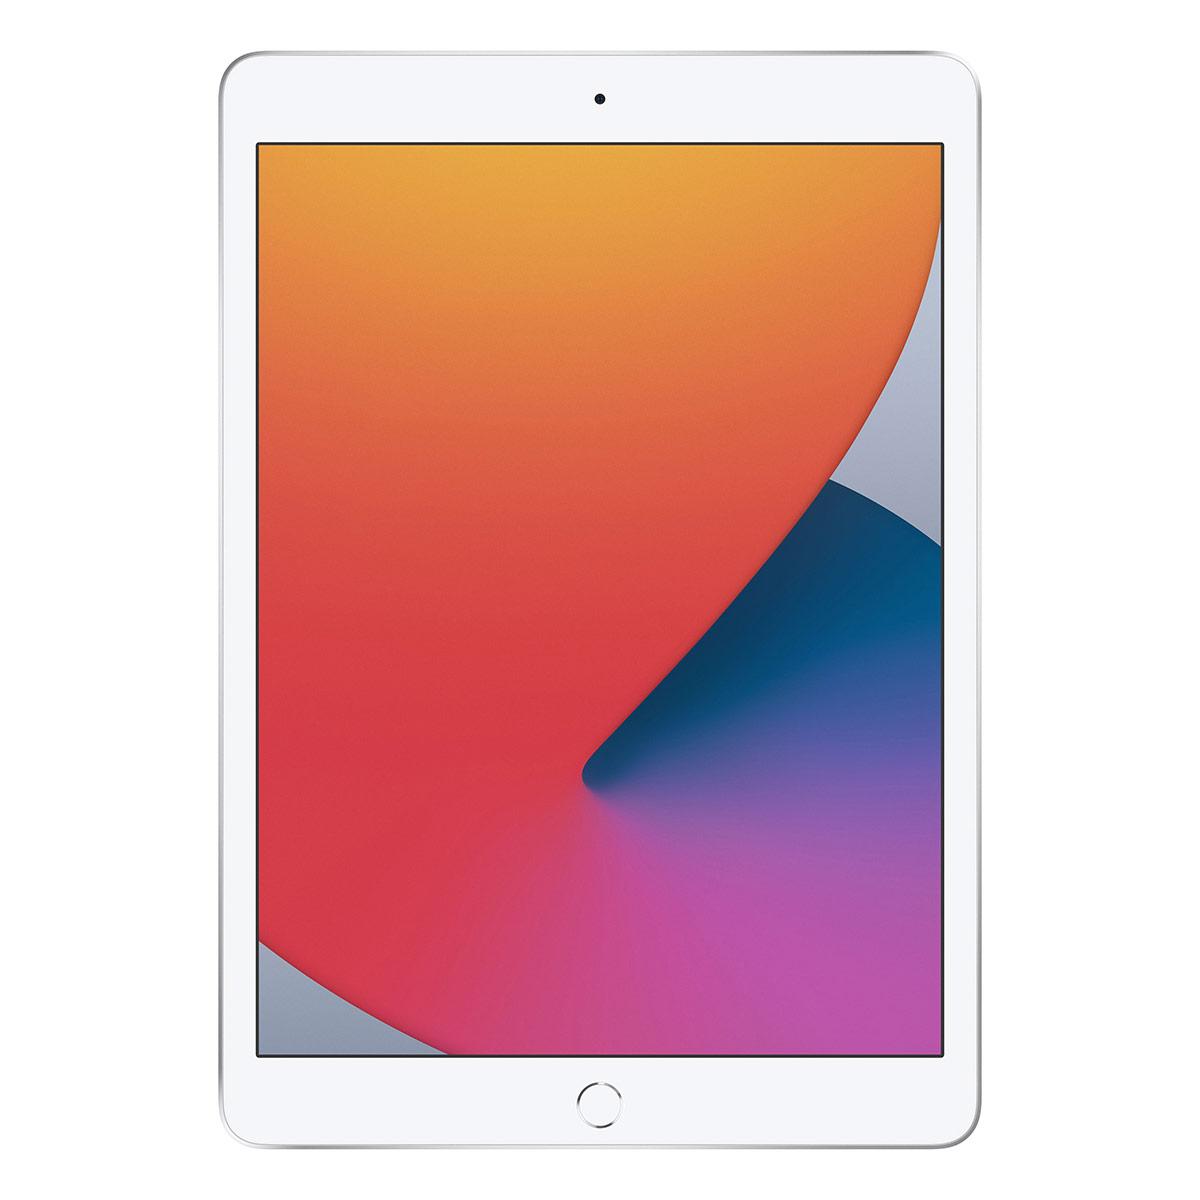 "Education Apple iPad 10.2"" 32GB WiFi - Silver"